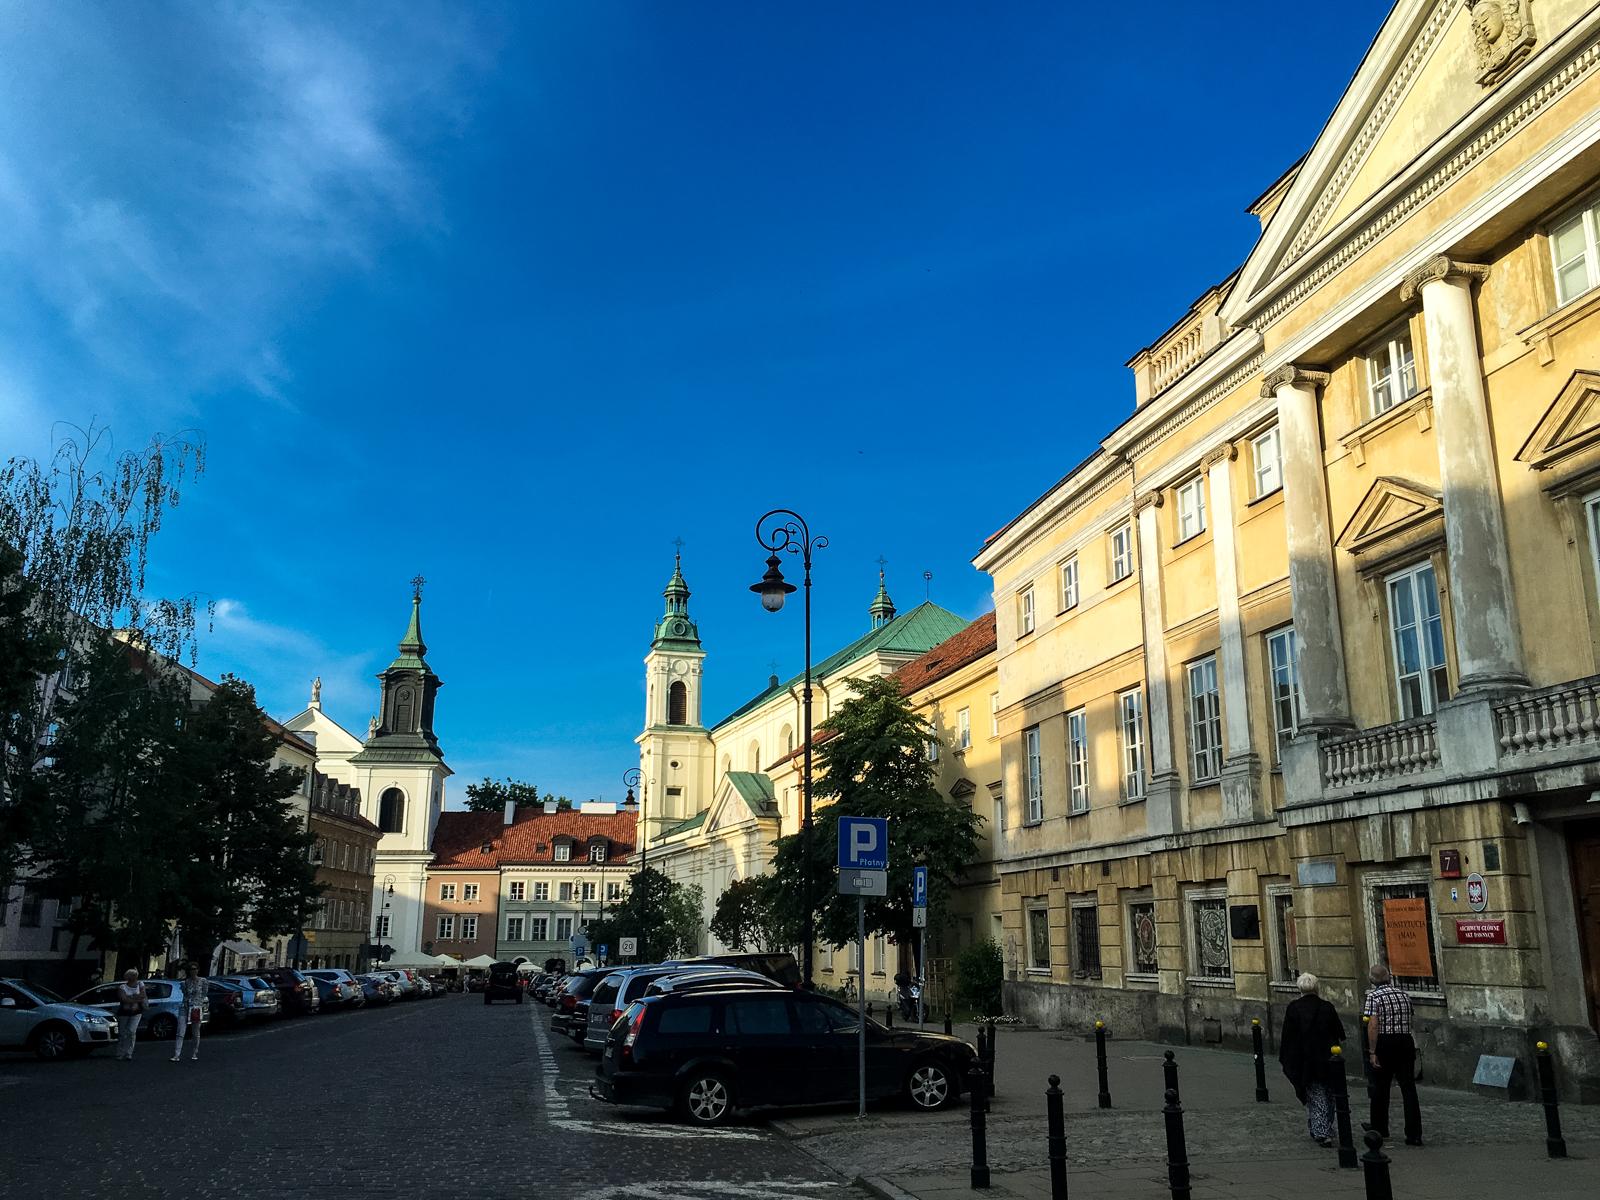 Poland_Germany_June2017-30.jpg